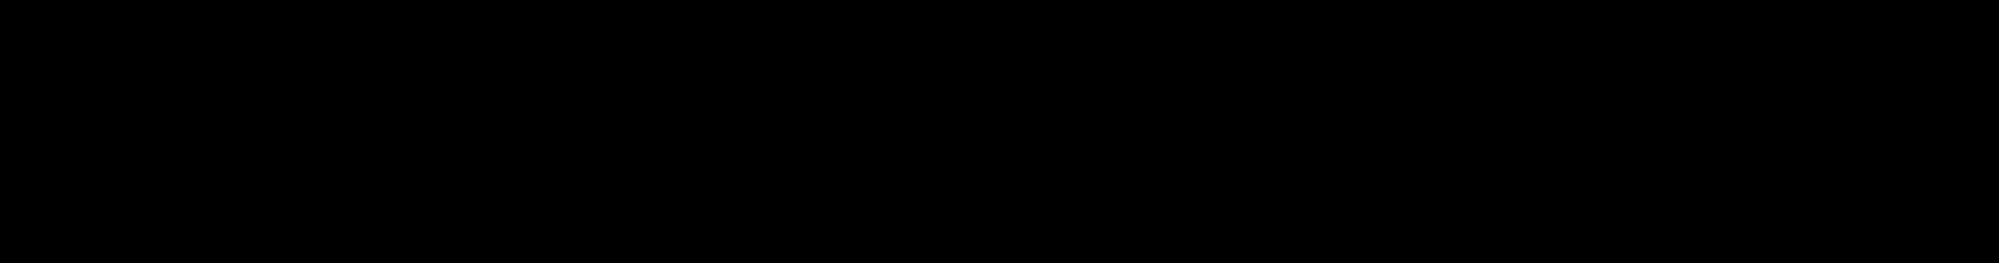 image72.png